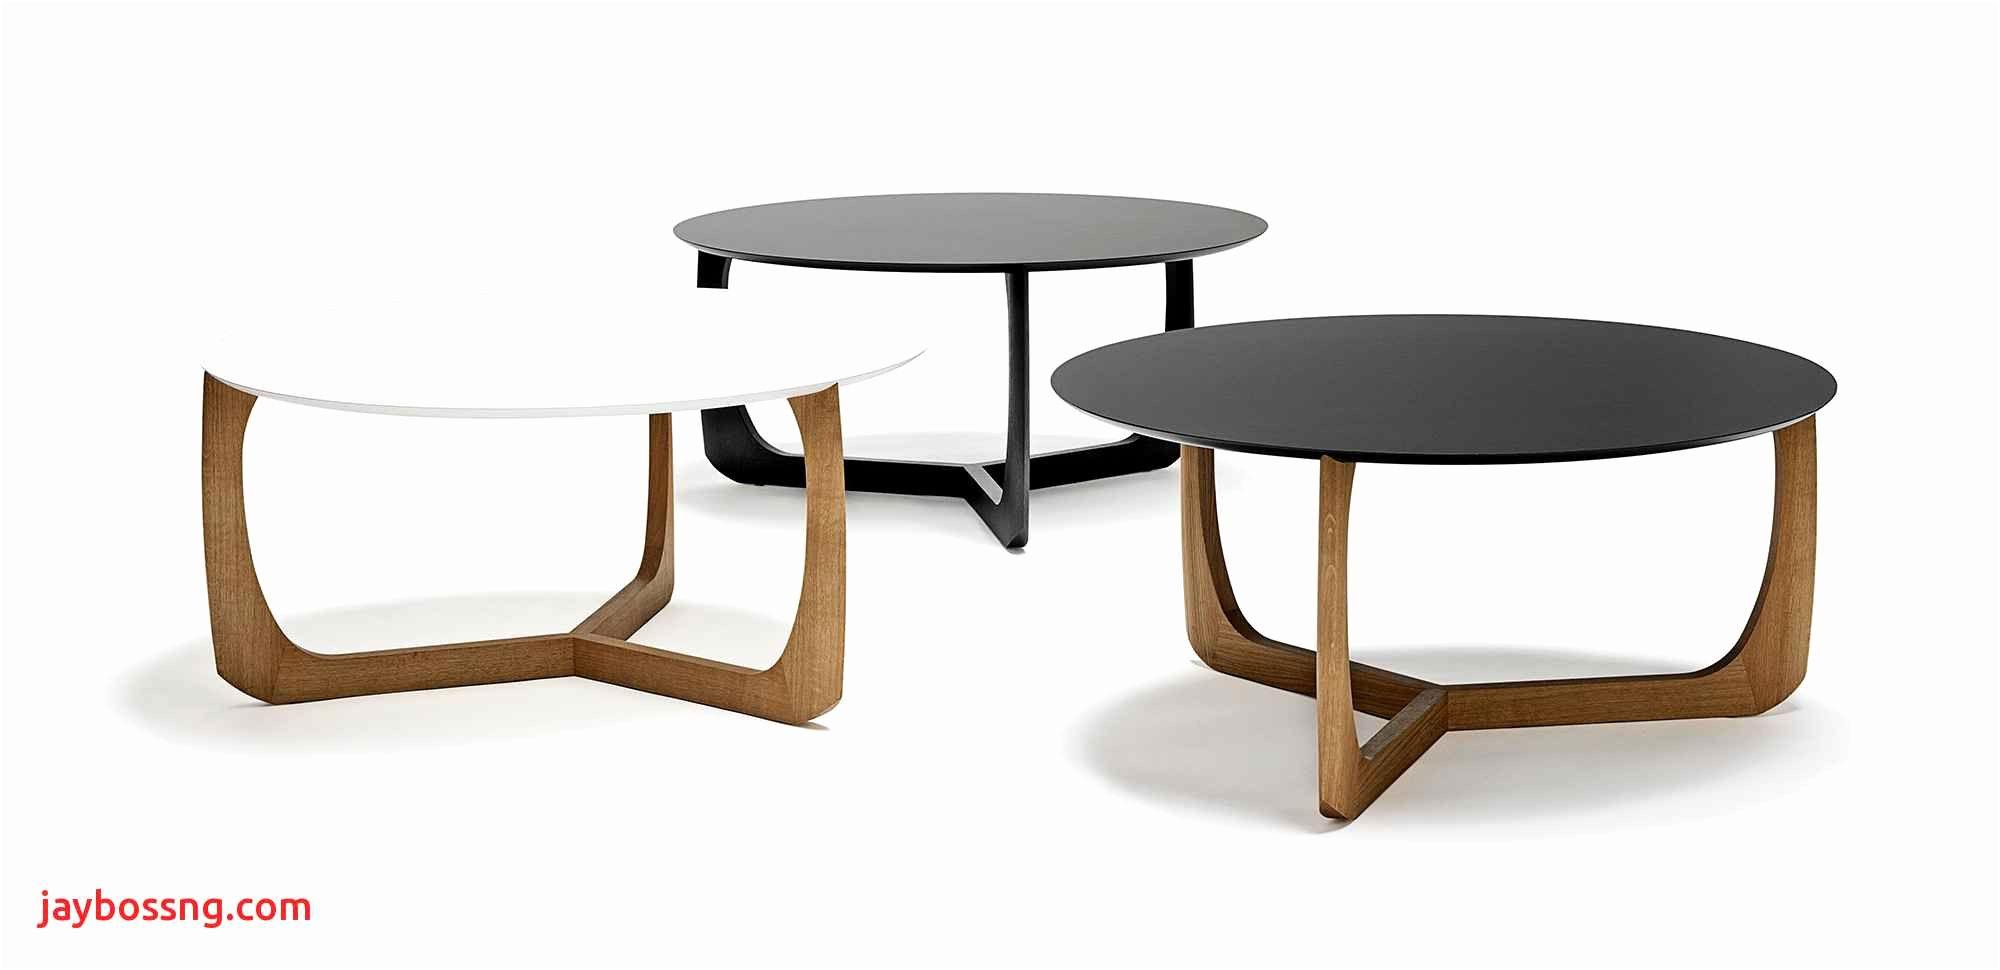 13 Biensur Table Ronde Pied Central Ikea Pics Mebel Meja